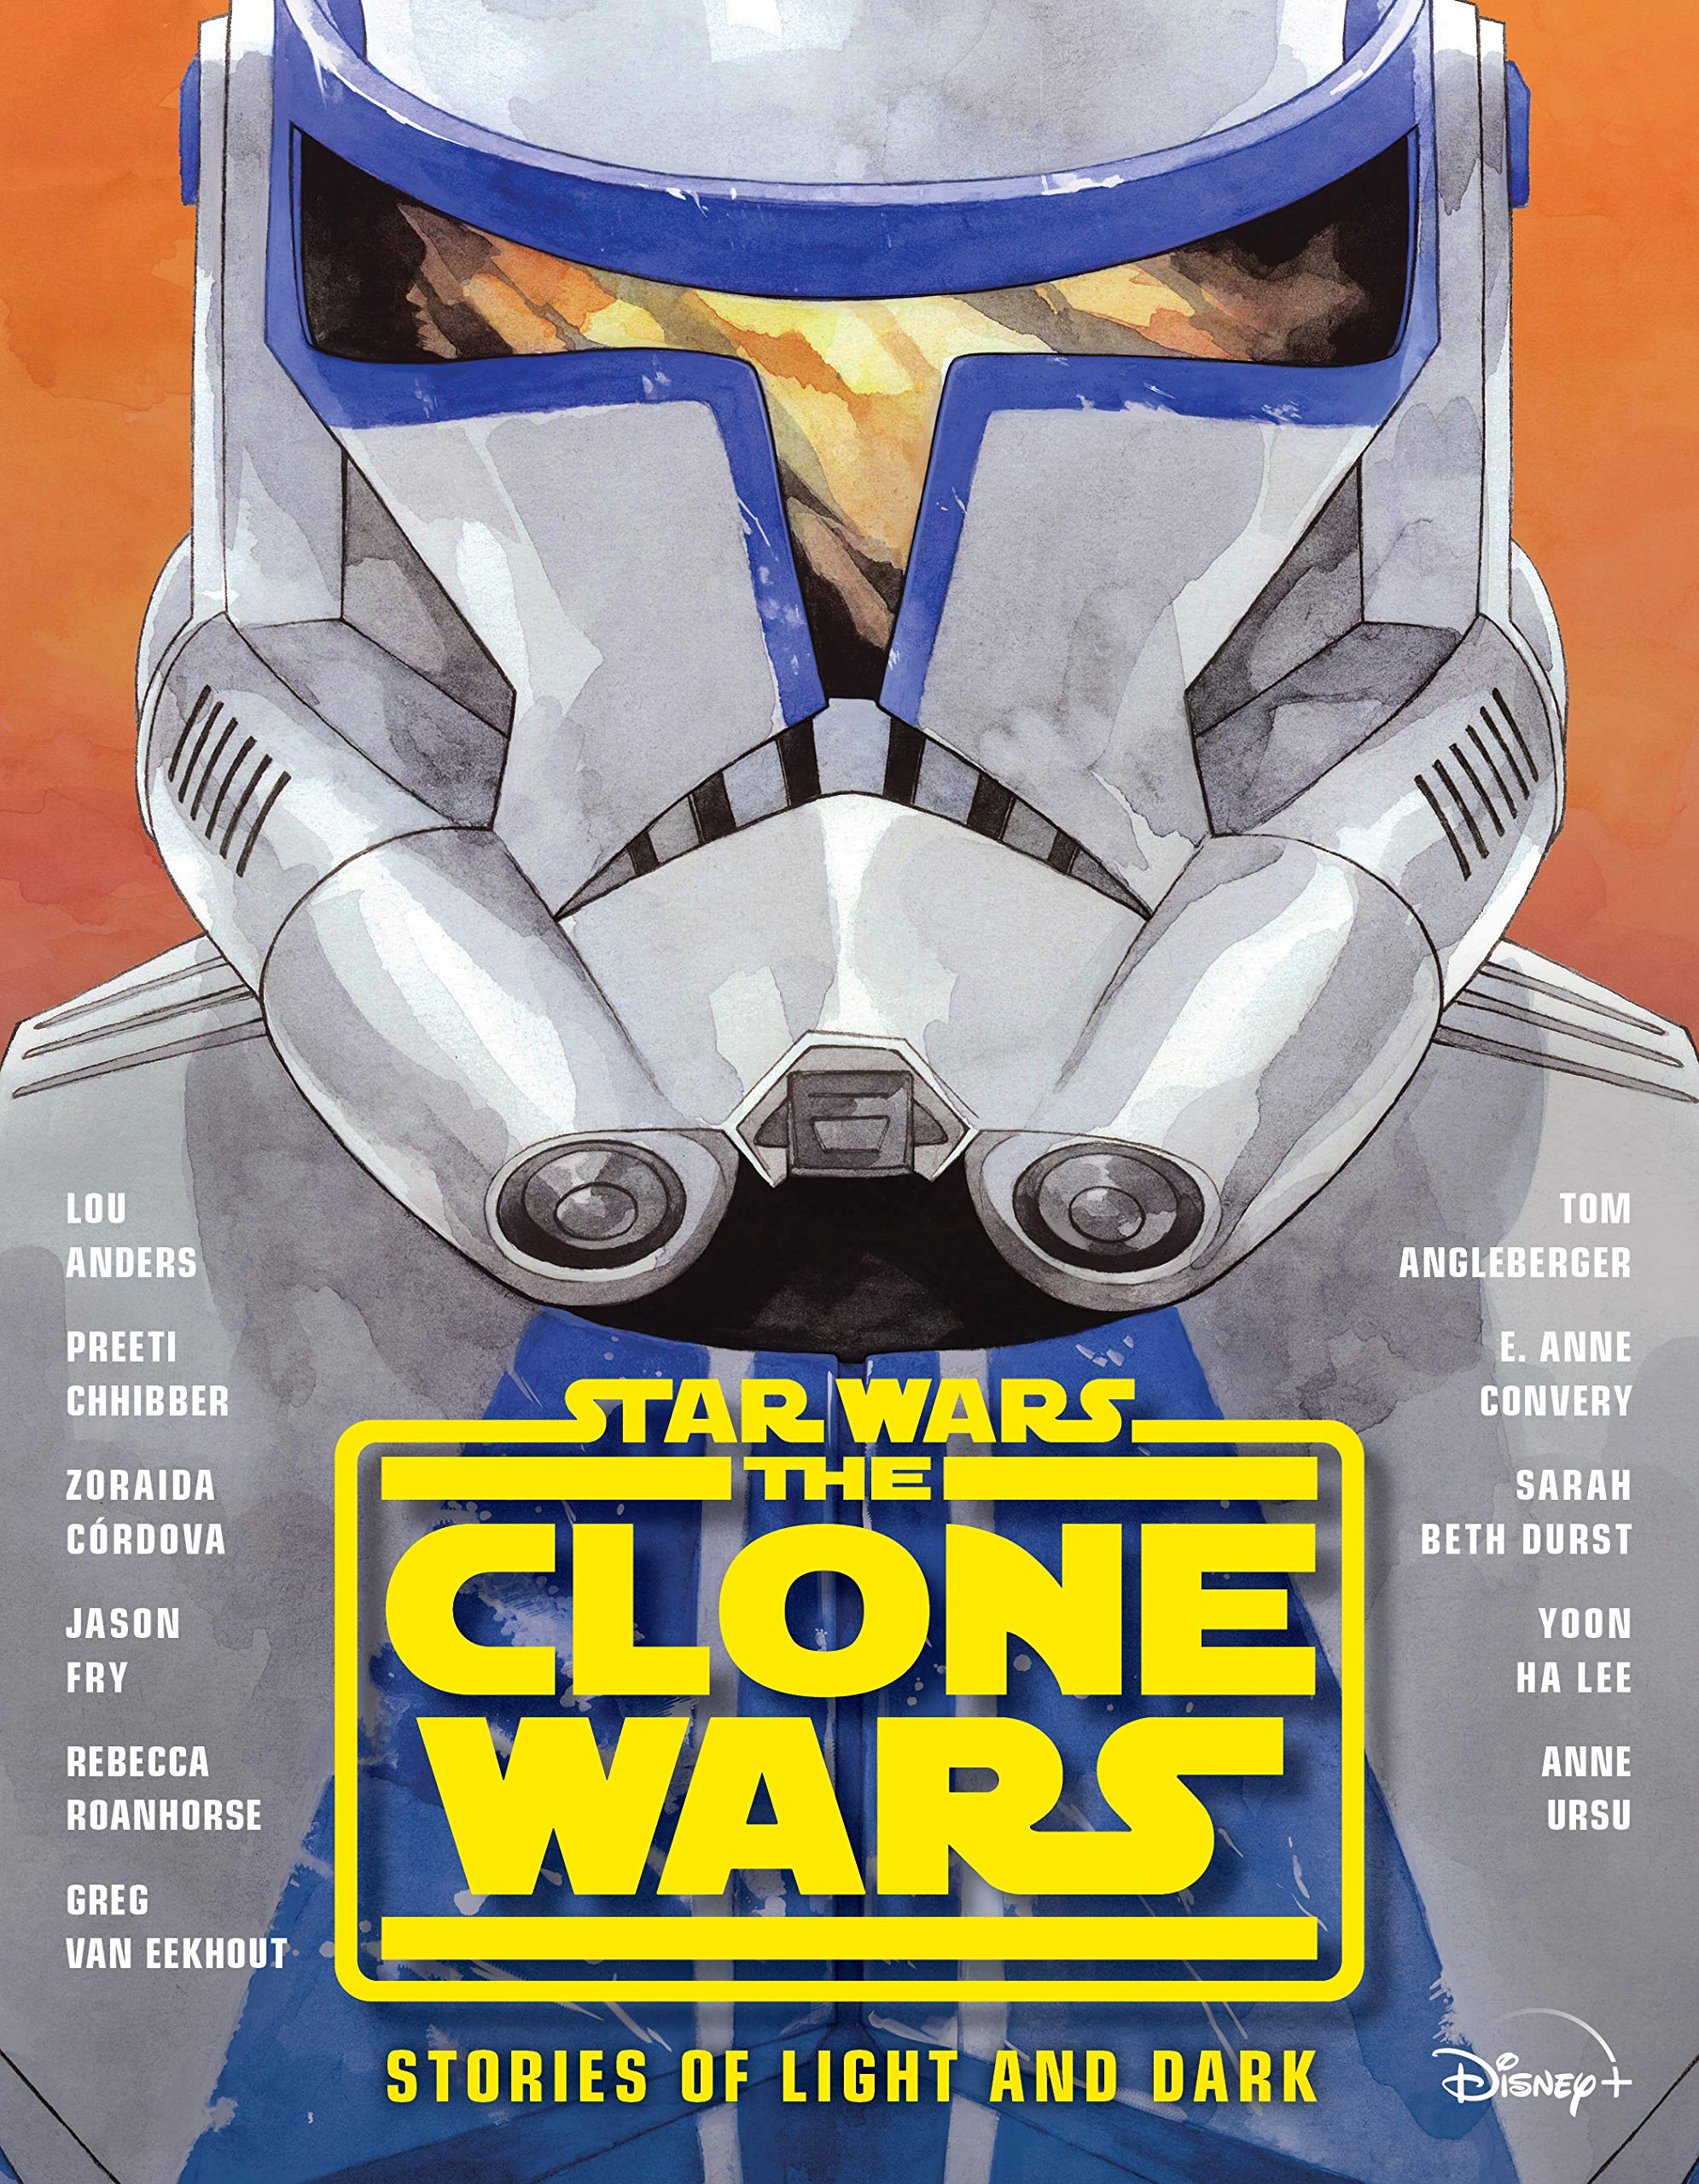 Star Wars the Clone Wars: Stories of Light and Dark (Inglés) Pasta dura